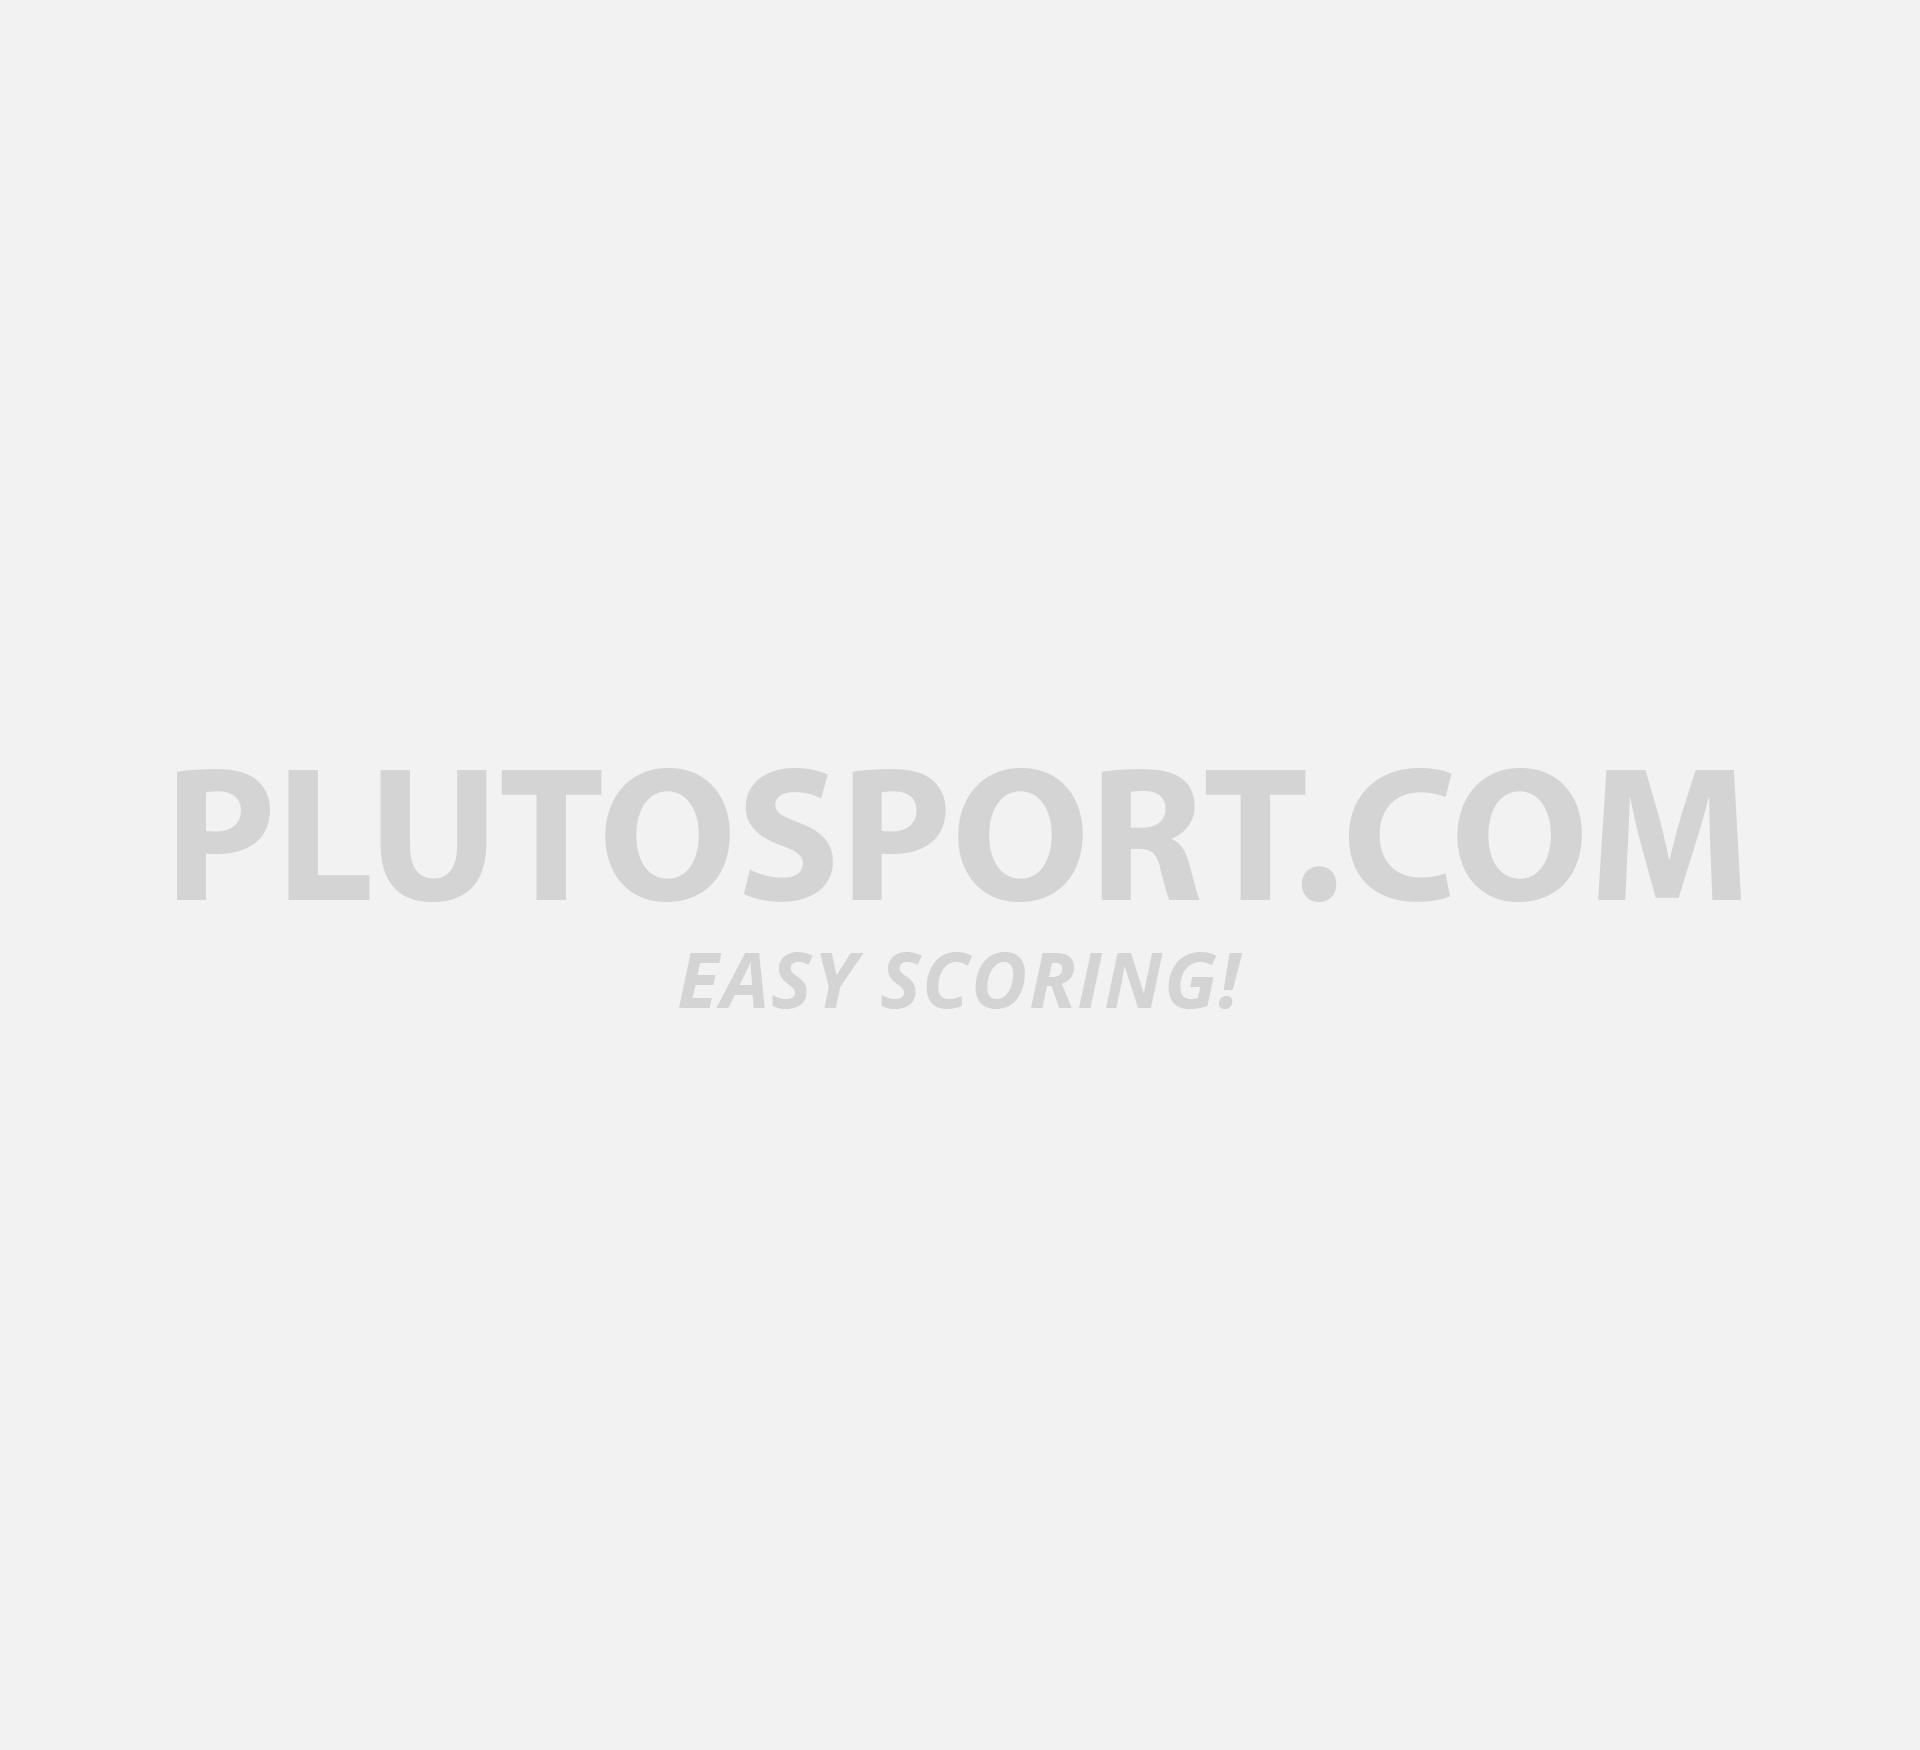 Adidas ACE 16.4 FxG J - Boots fixed stud - Shoes - Football - Sports ... 037c3b22ef4af